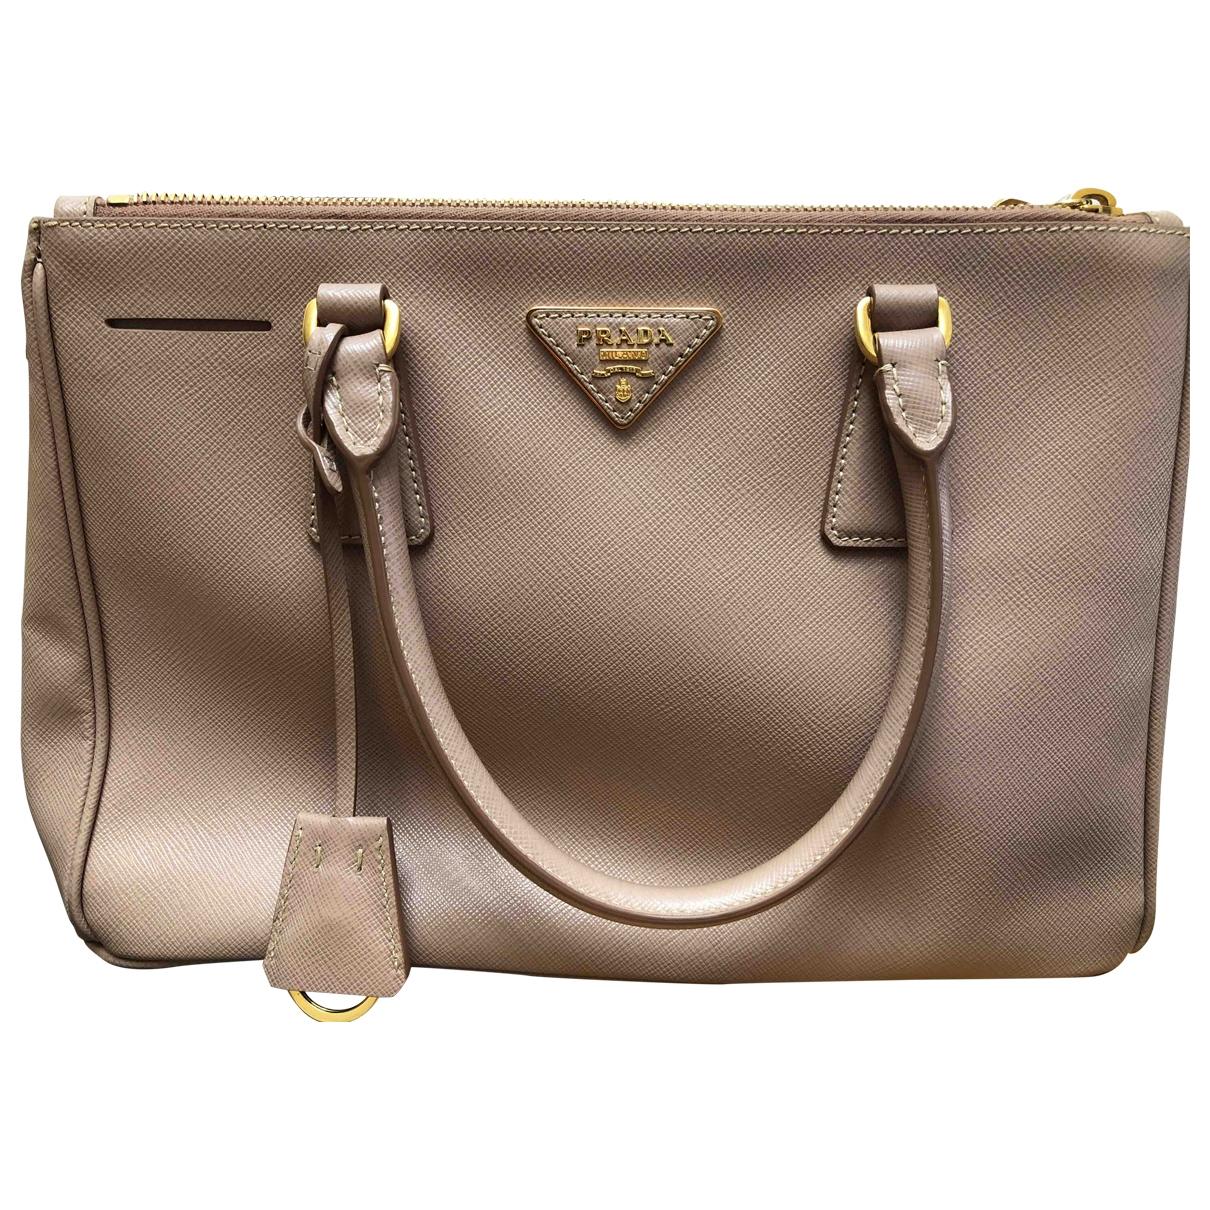 Prada Galleria Handtasche in  Beige Leder